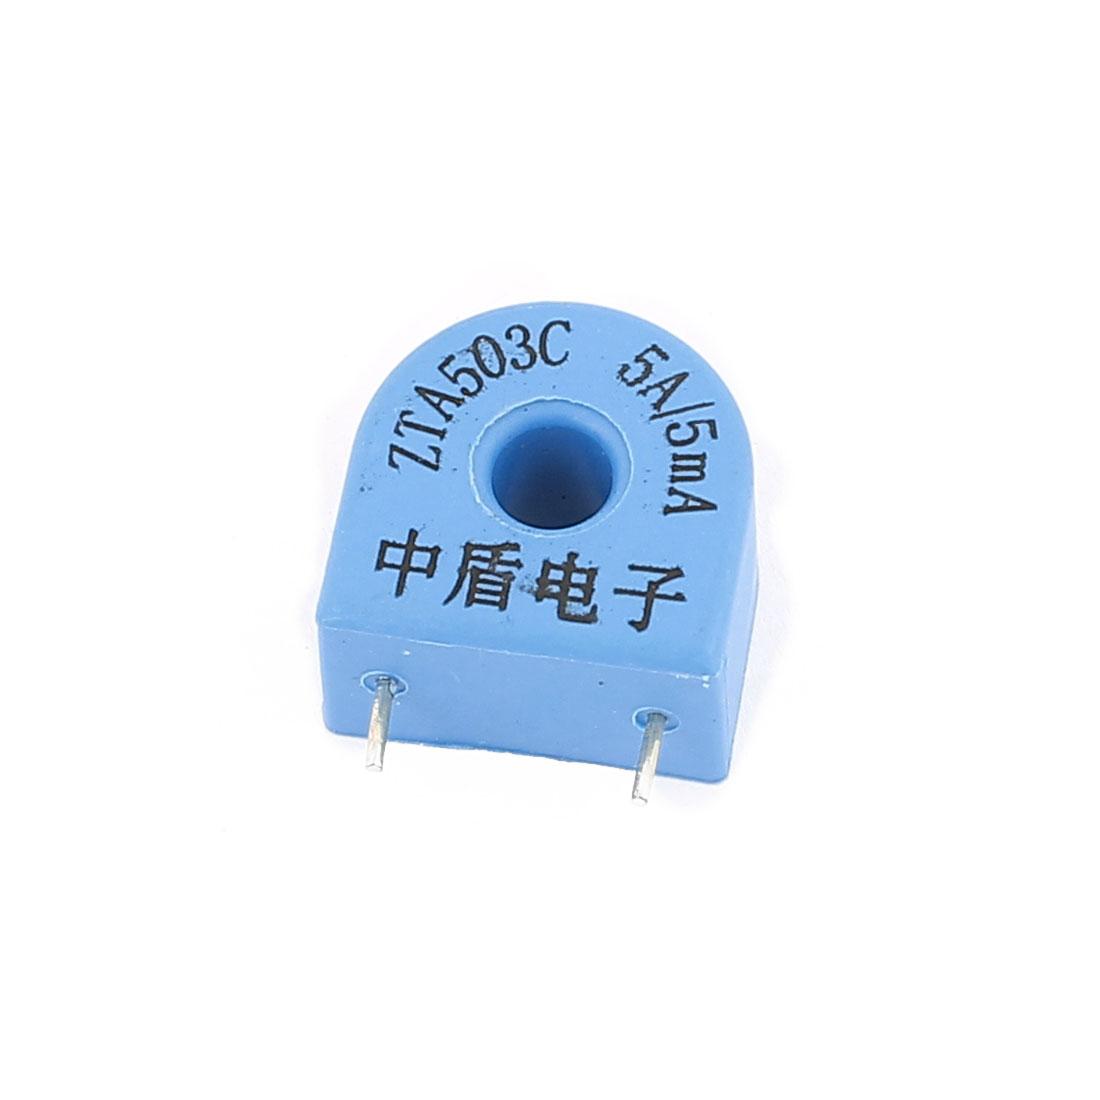 ZTA503C 5A/5mA 2 Terminal Precision AC Micro Current Transformer Sensor